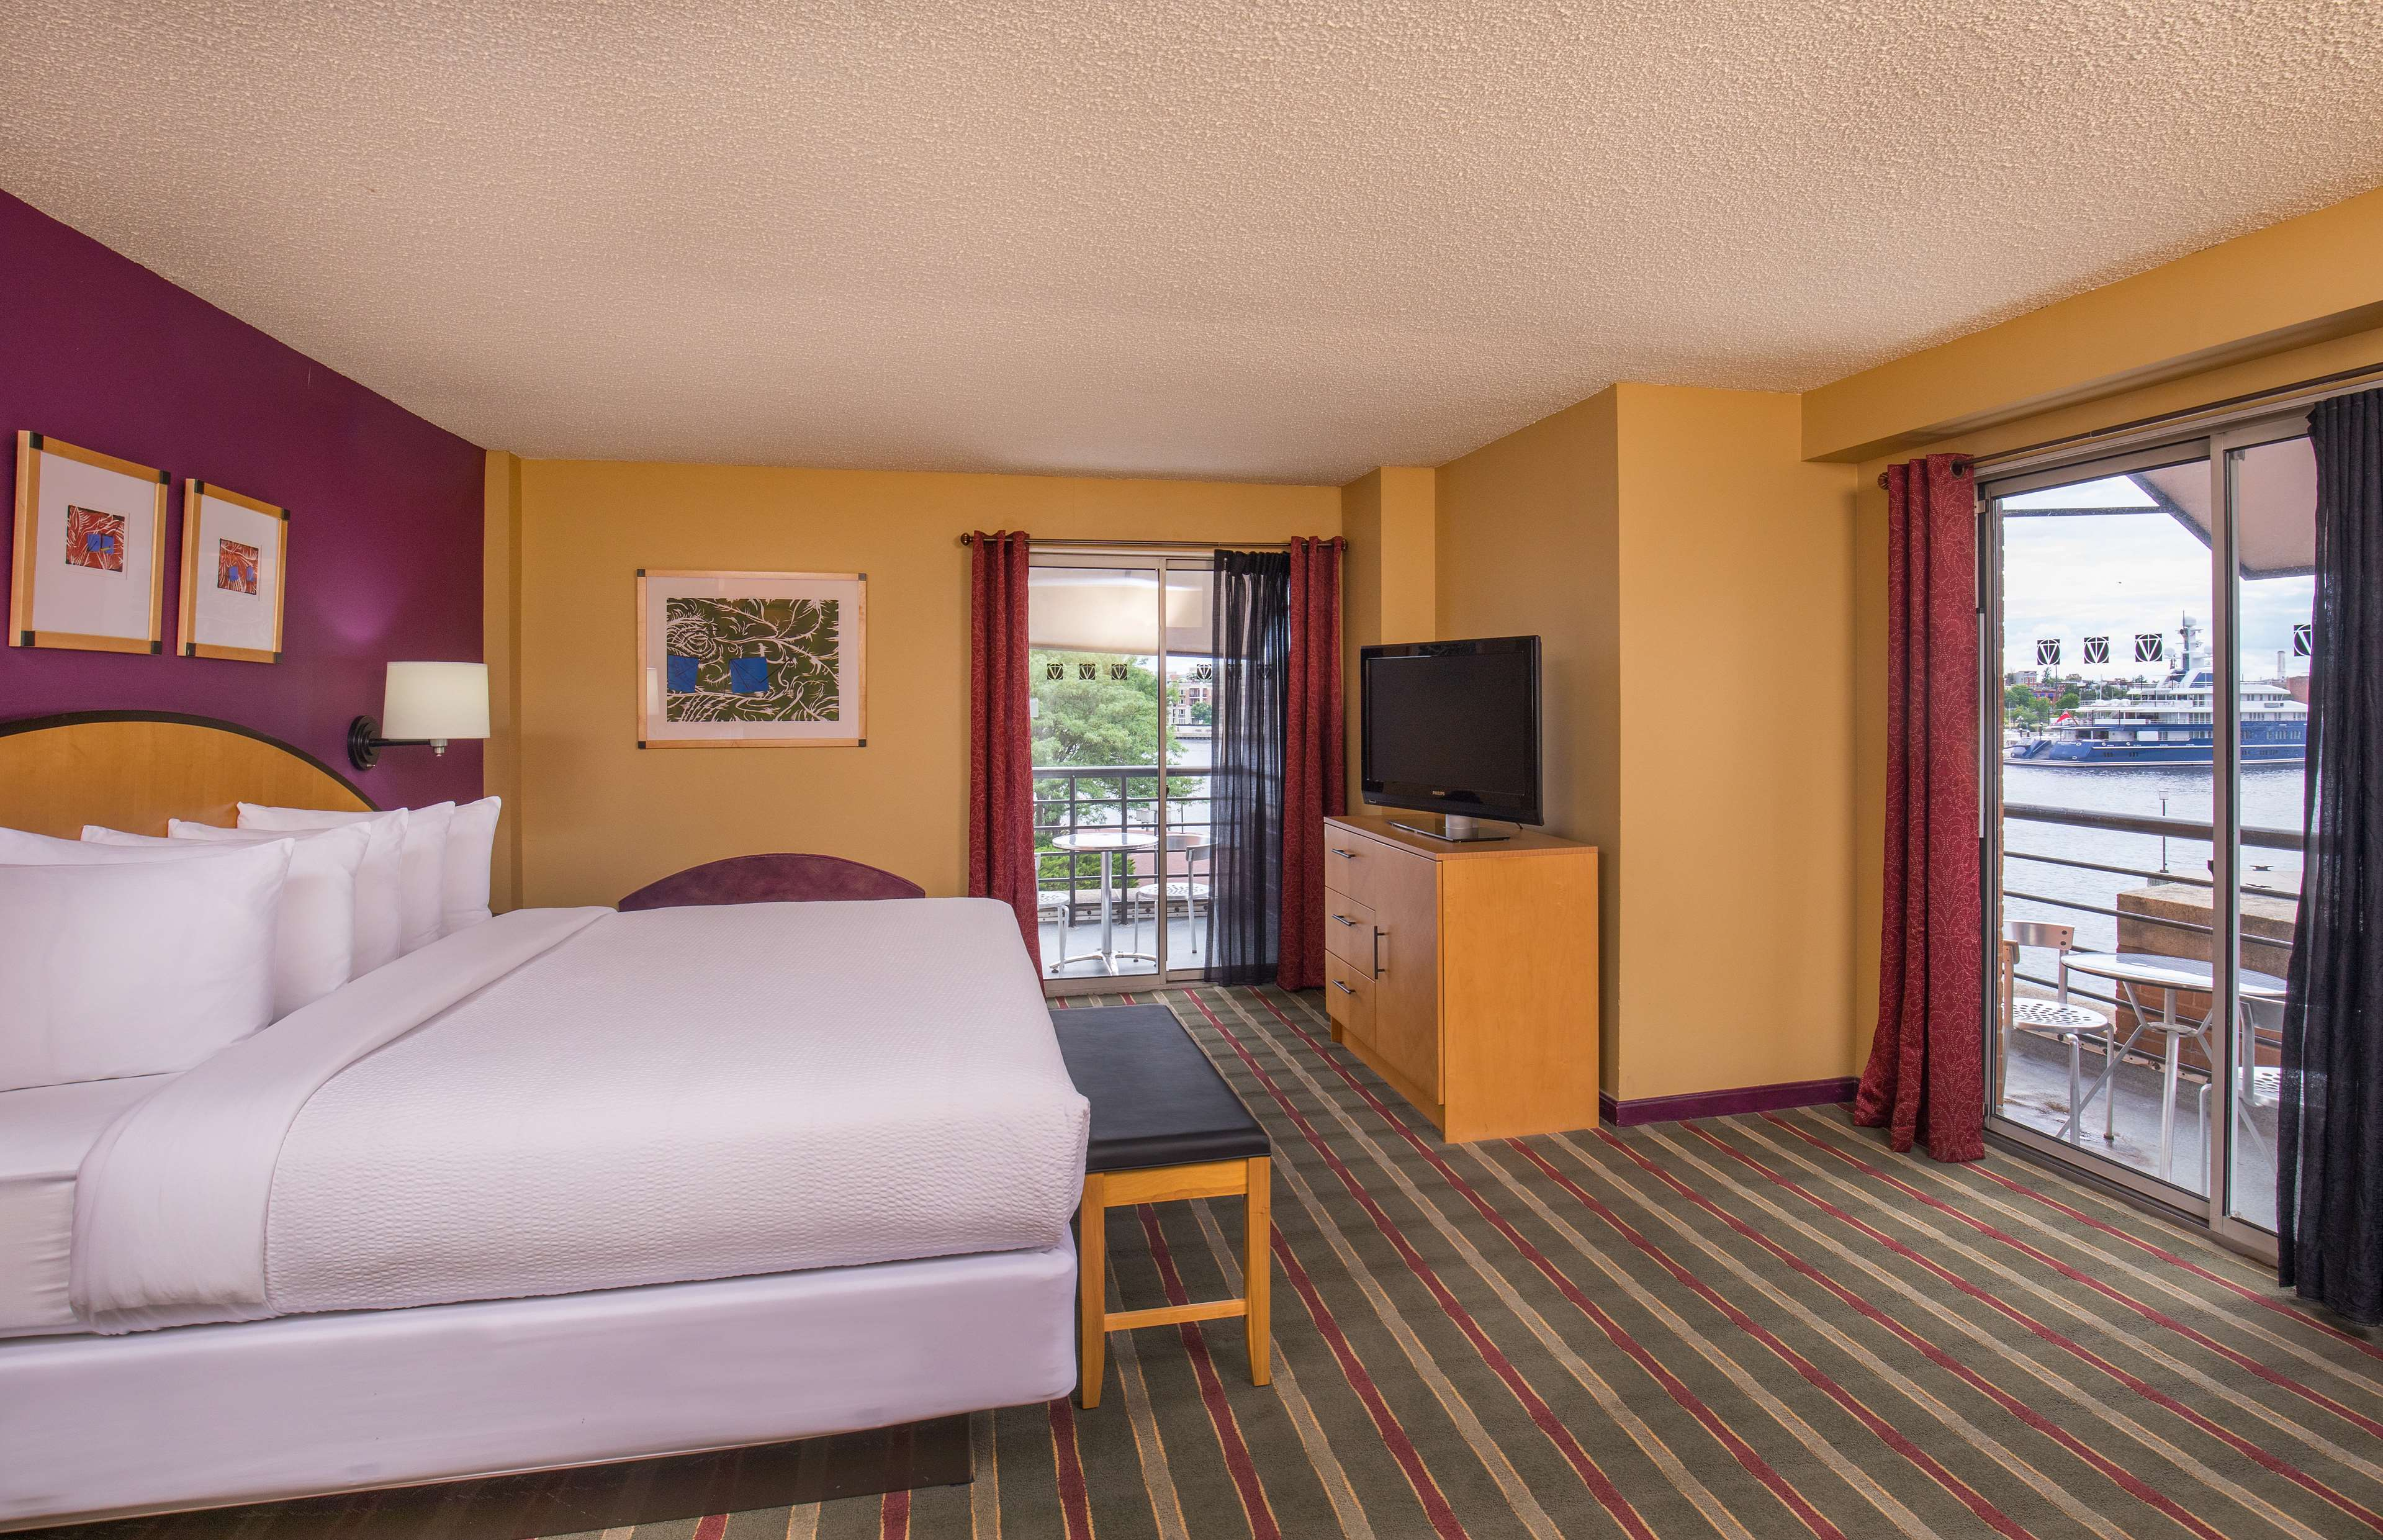 Pier 5 Hotel Baltimore, Curio Collection by Hilton image 13